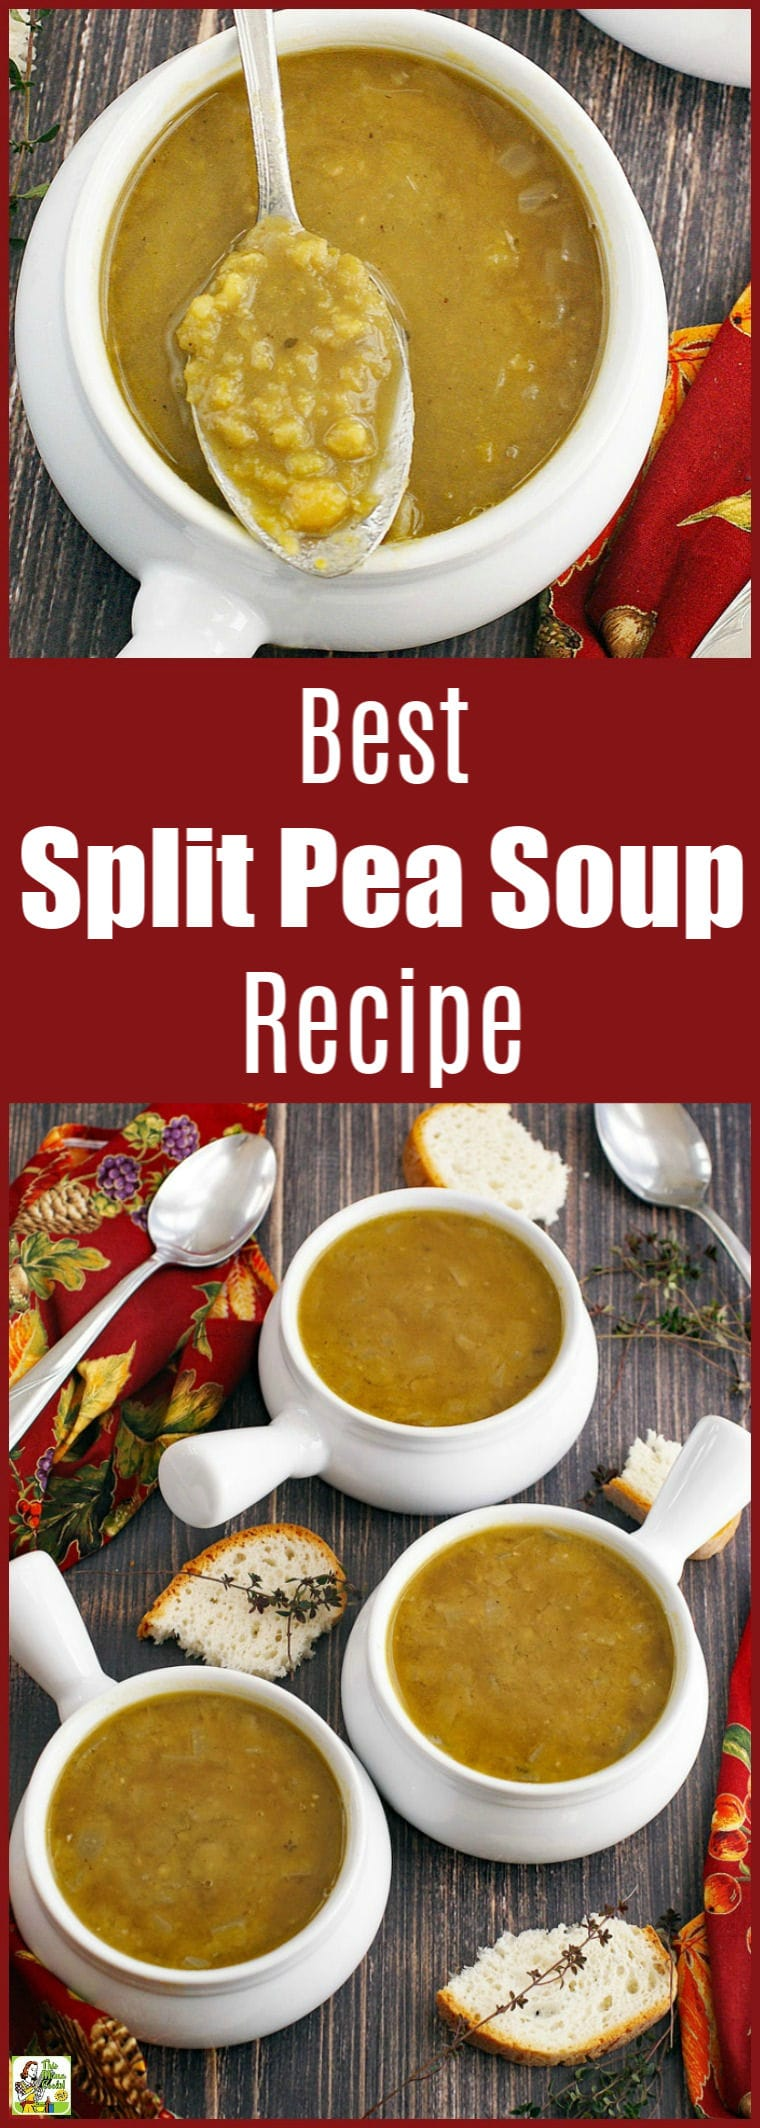 The Best Split Pea Soup recipe for busy weeknights